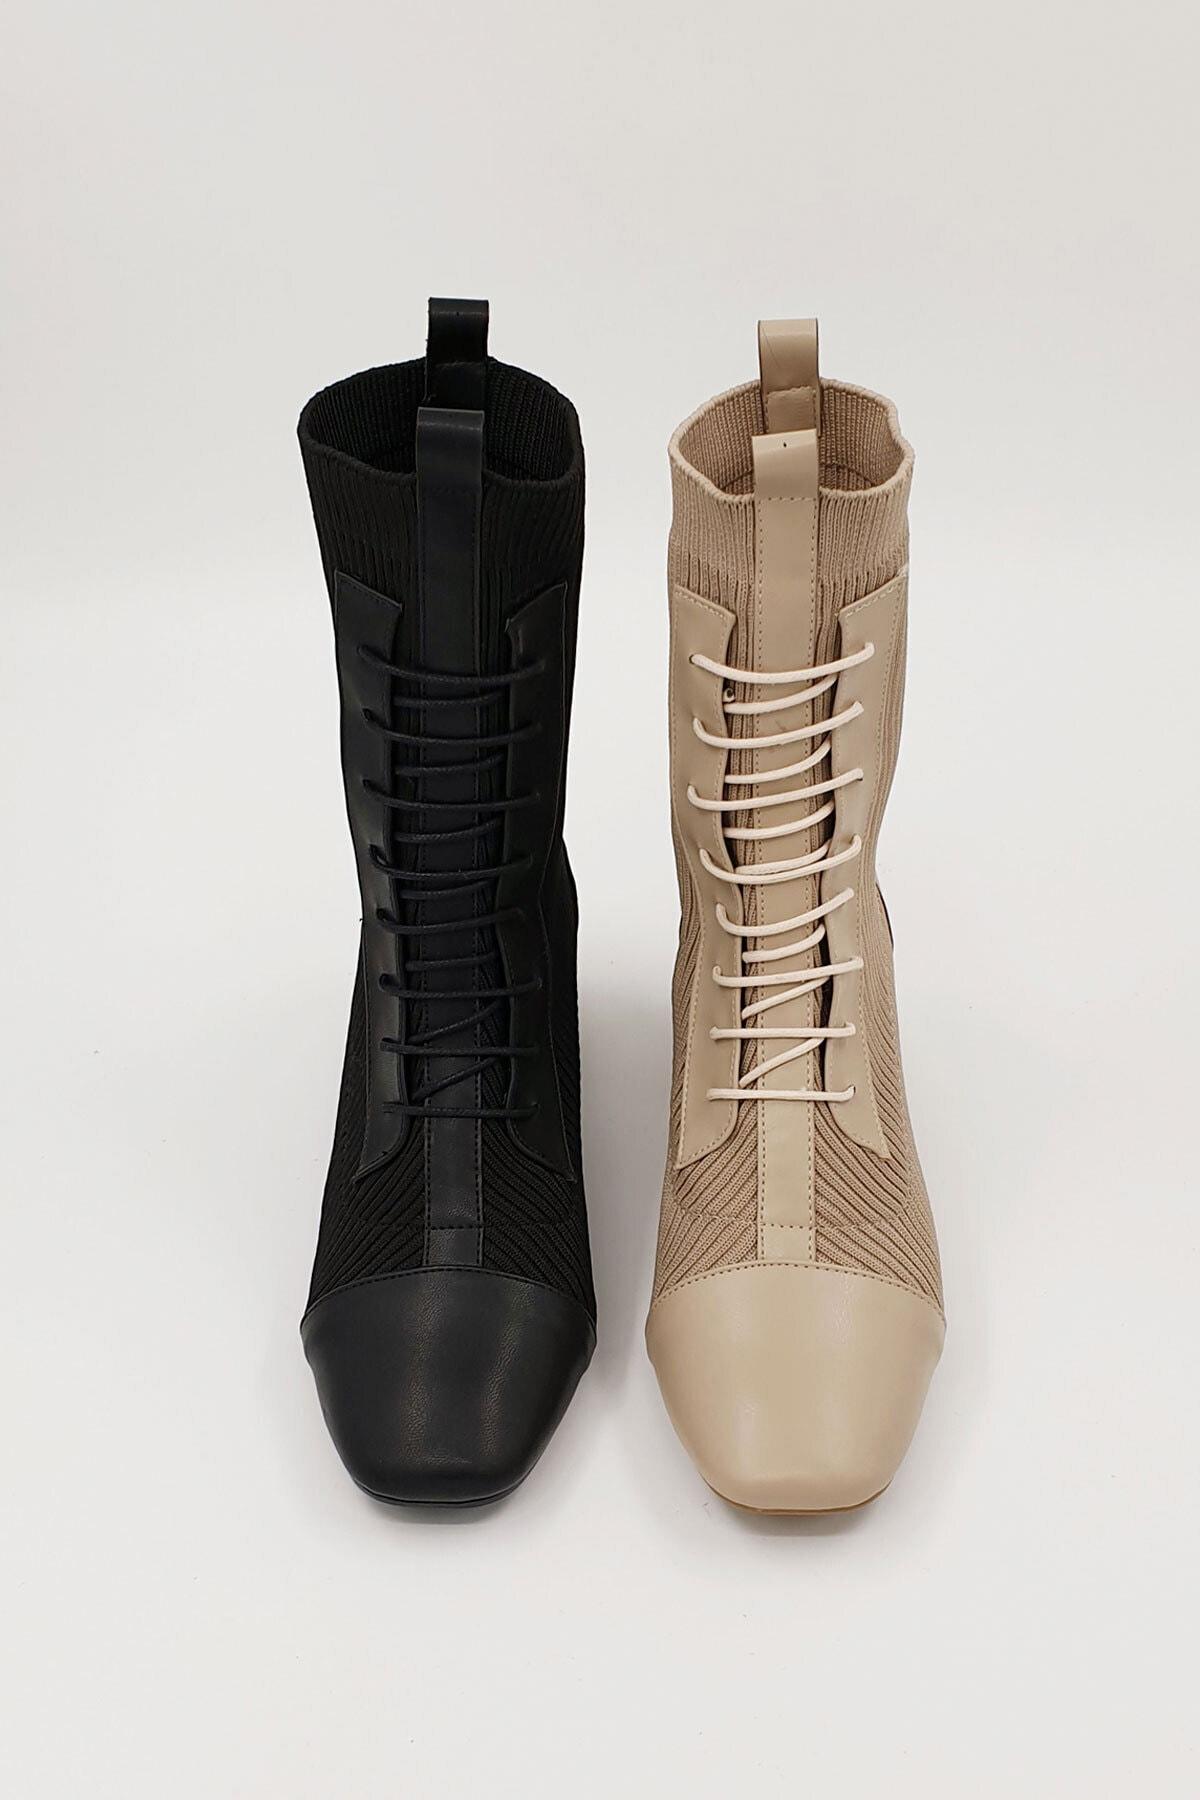 Marjin Larin Kadın Çorap Topuklu Botsiyah 2